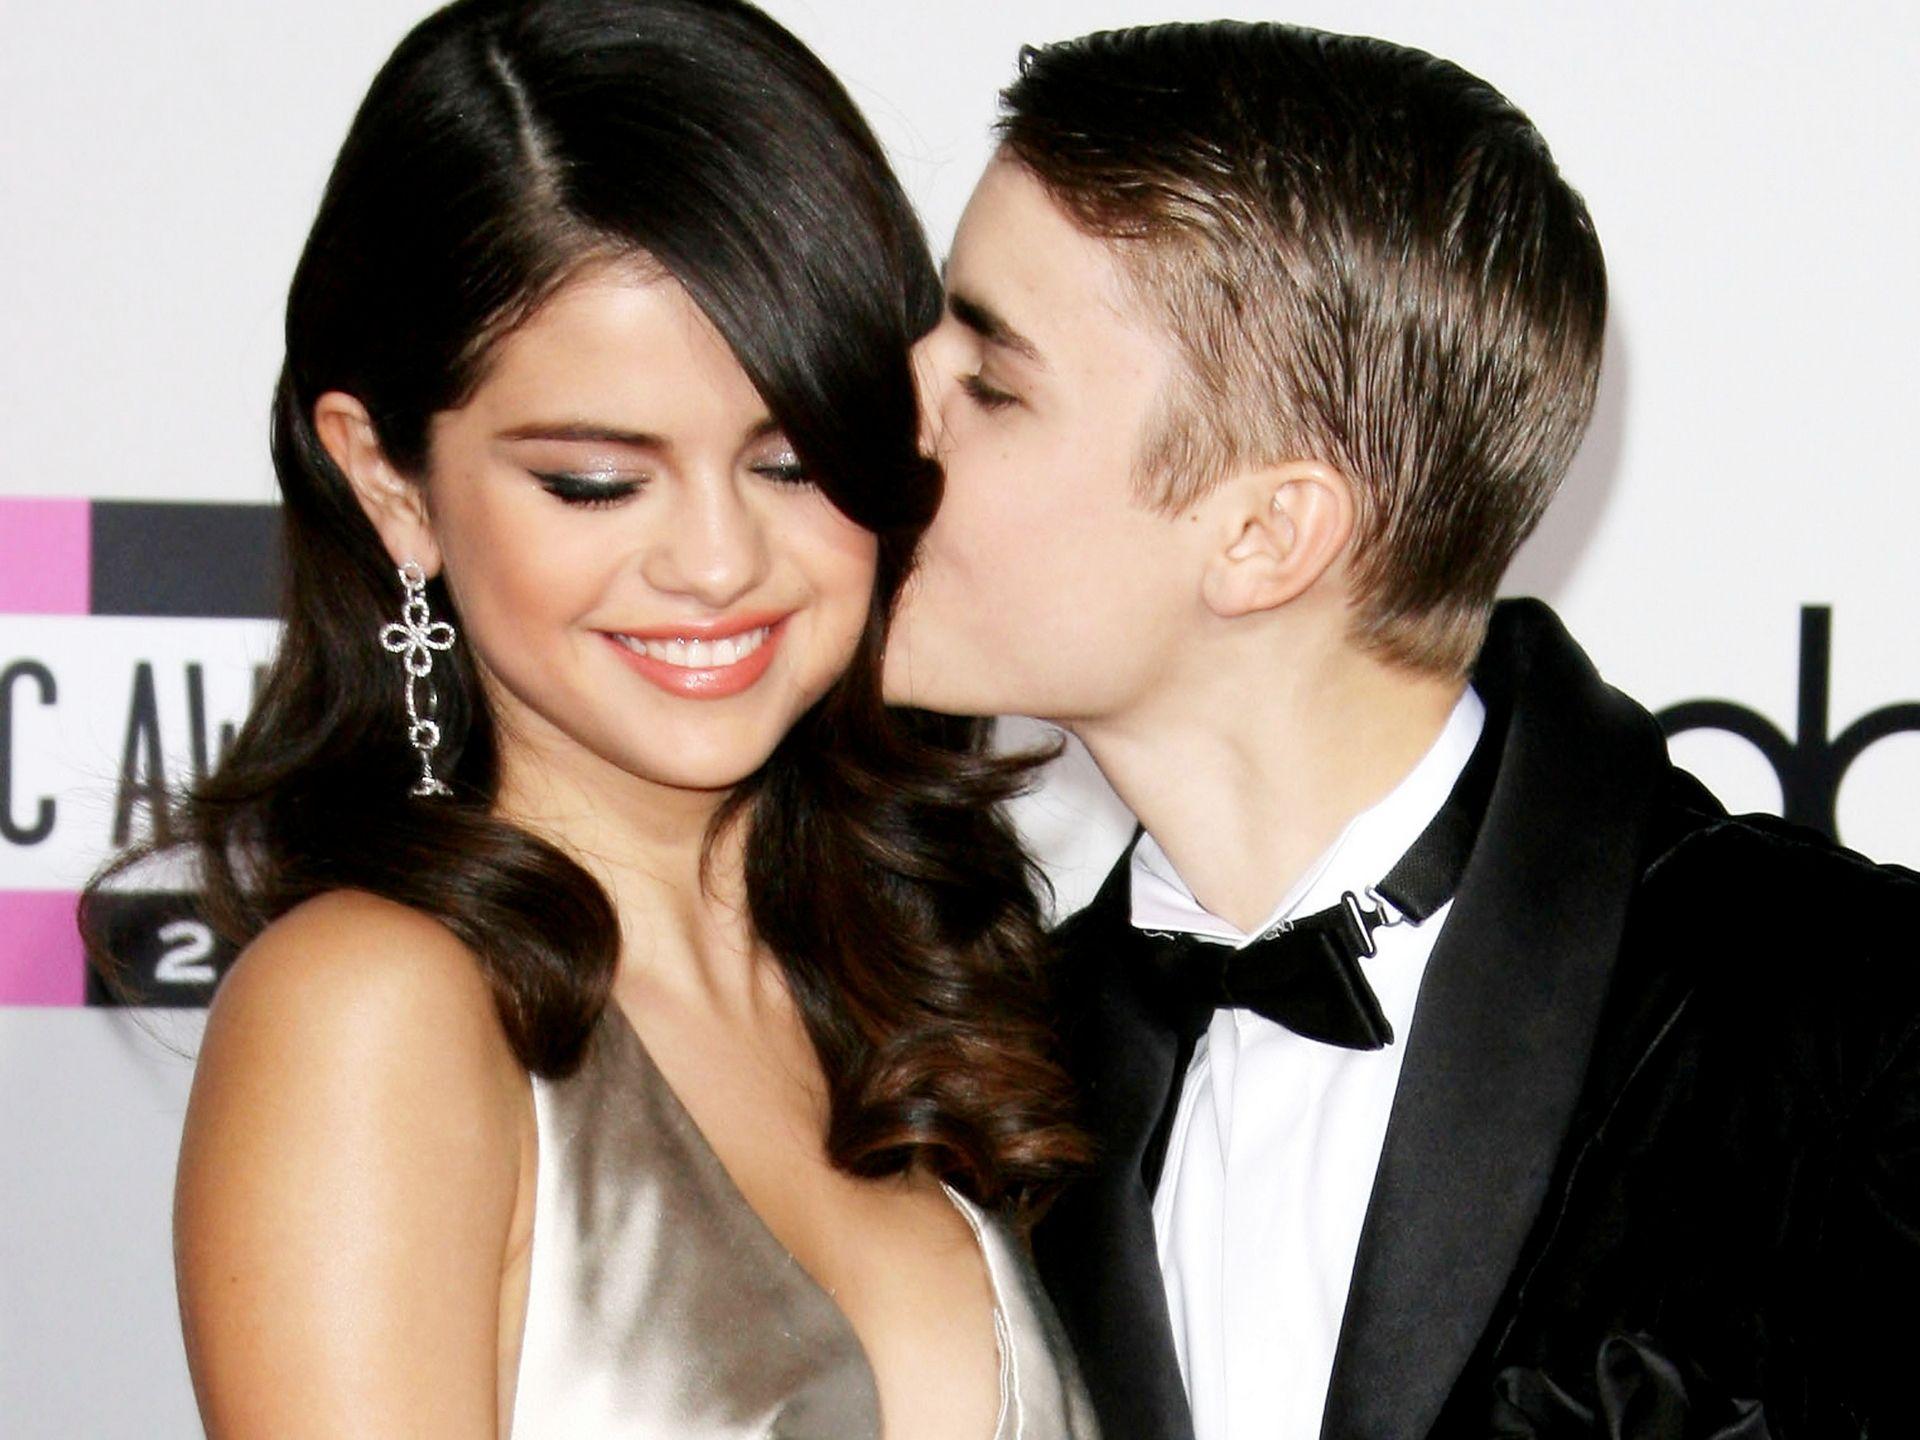 Justin Bieber And Selena Gomez Wallpaper Free Justin Bieber And Selena Selena Gomez Kiss Justin Selena